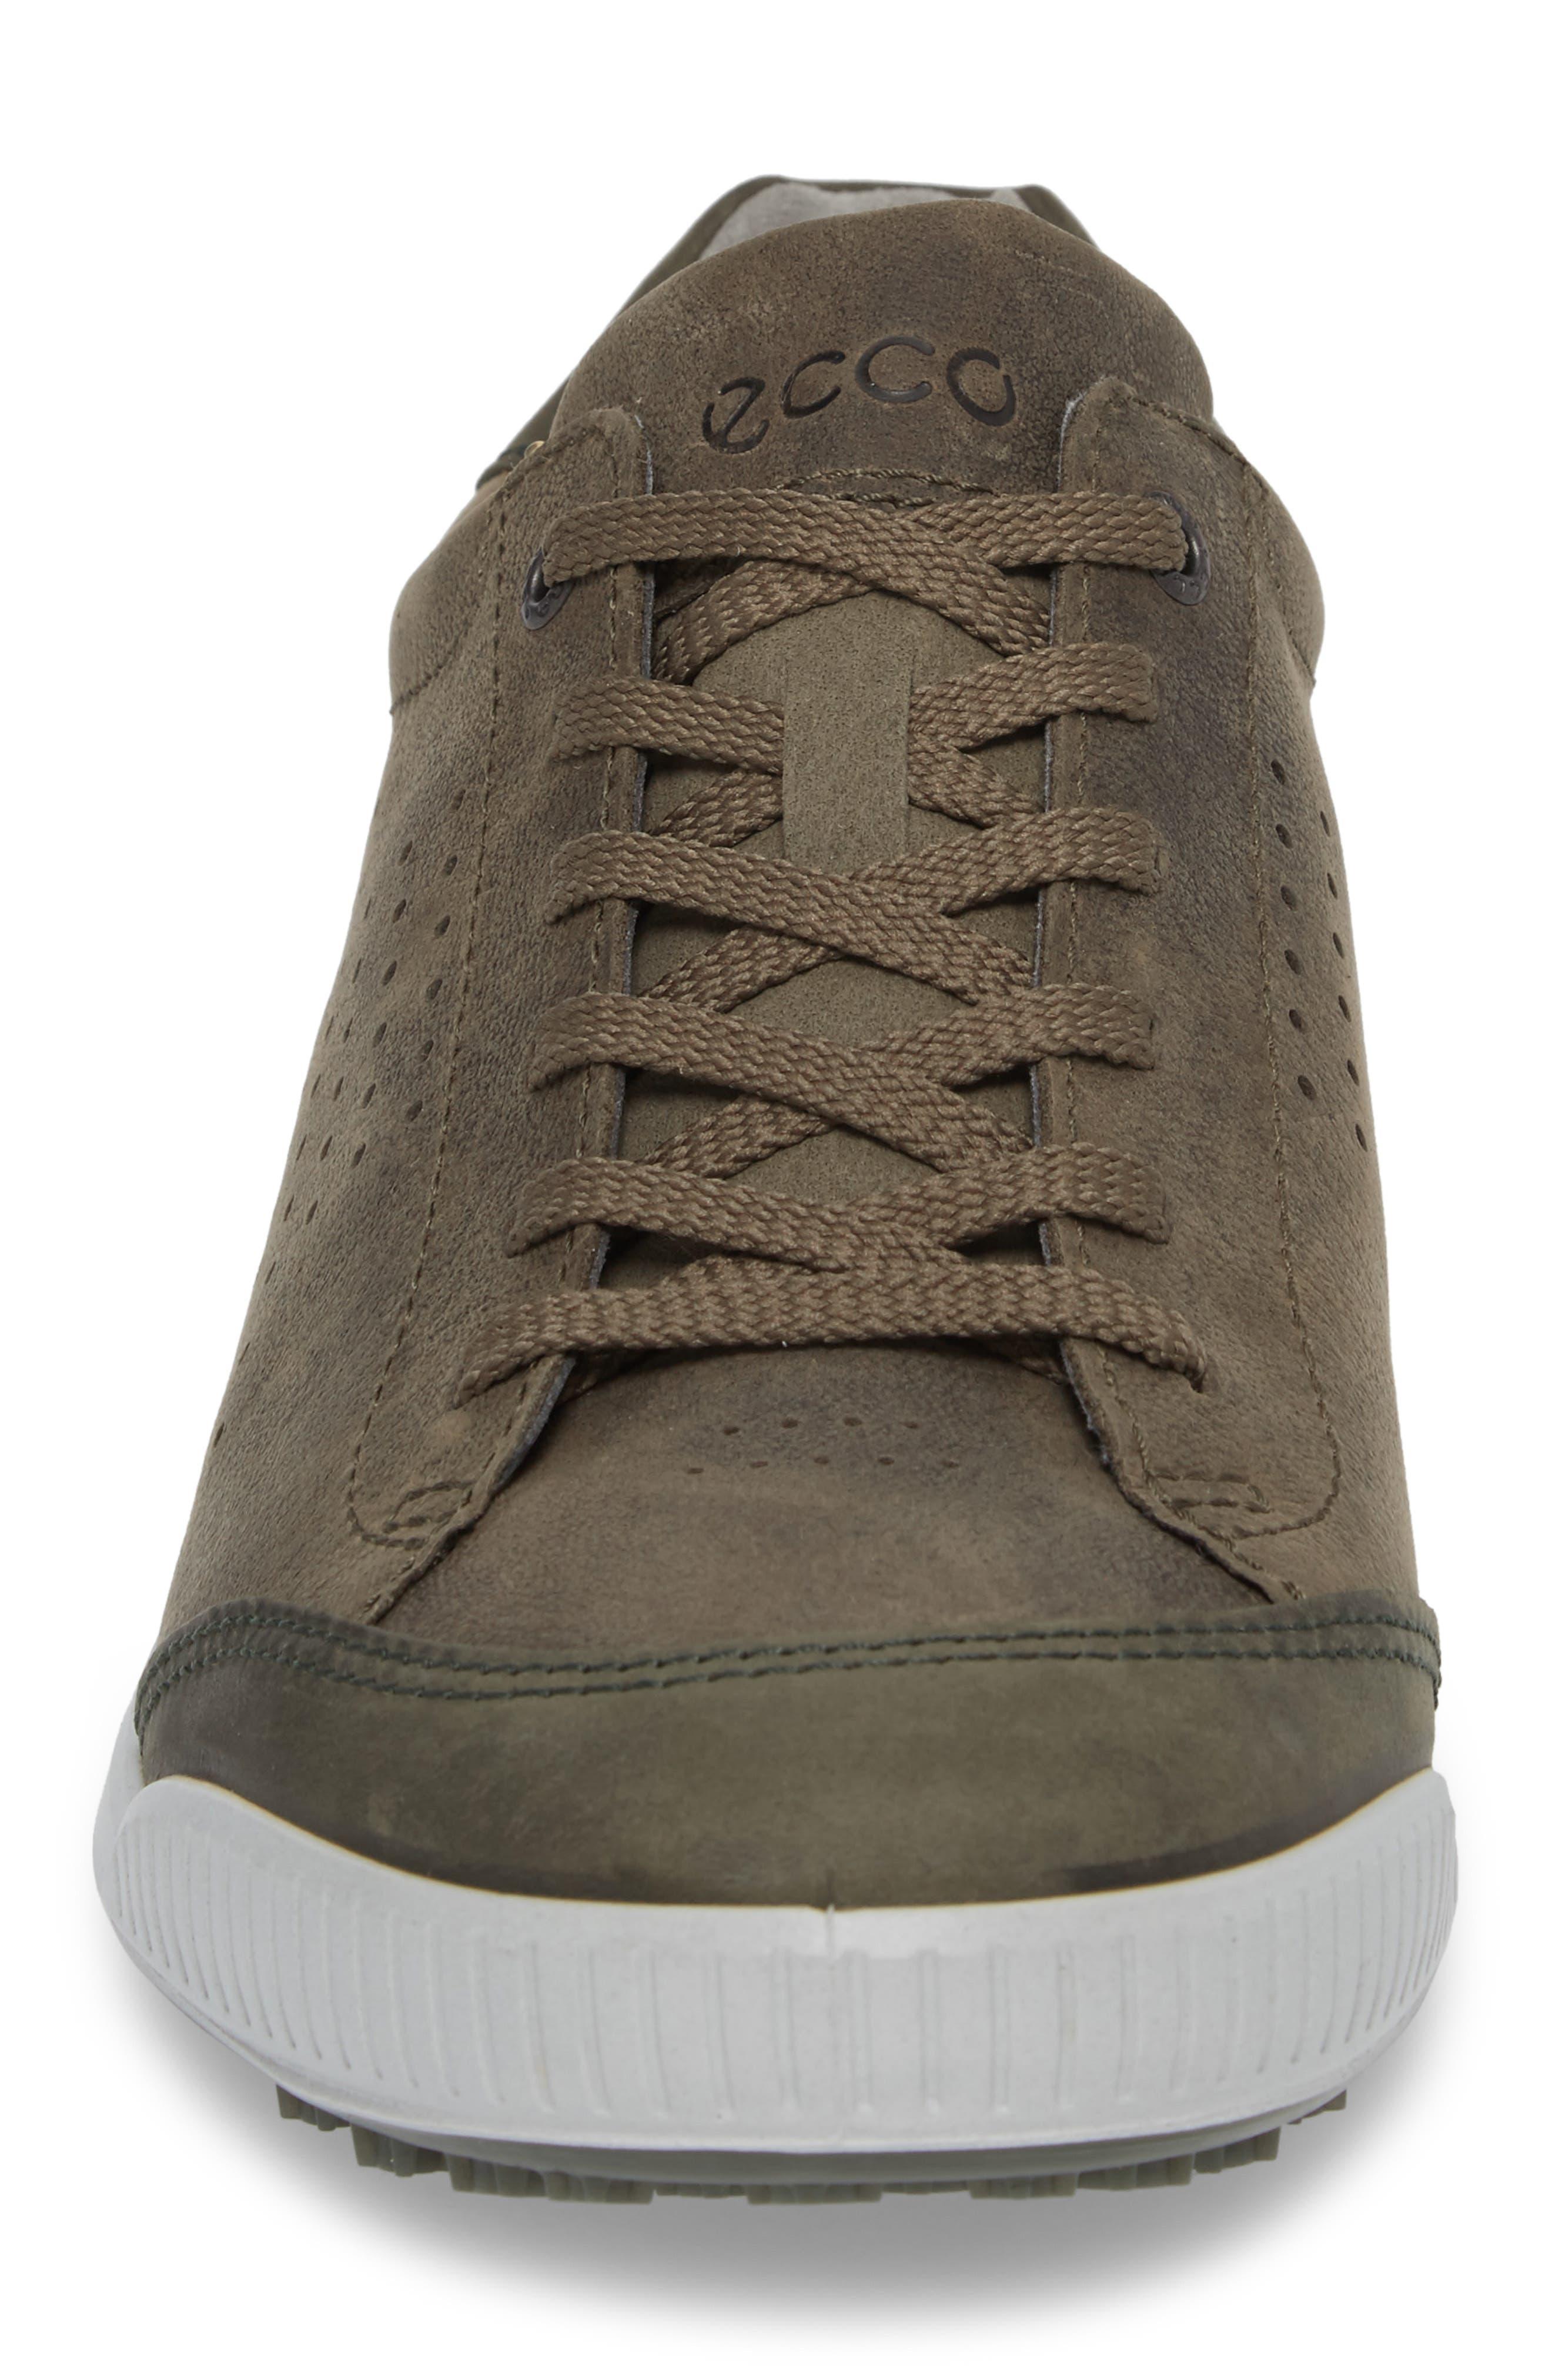 Street Retro HM Golf Shoe,                             Alternate thumbnail 4, color,                             Tarmac/ Deep Fore Leather